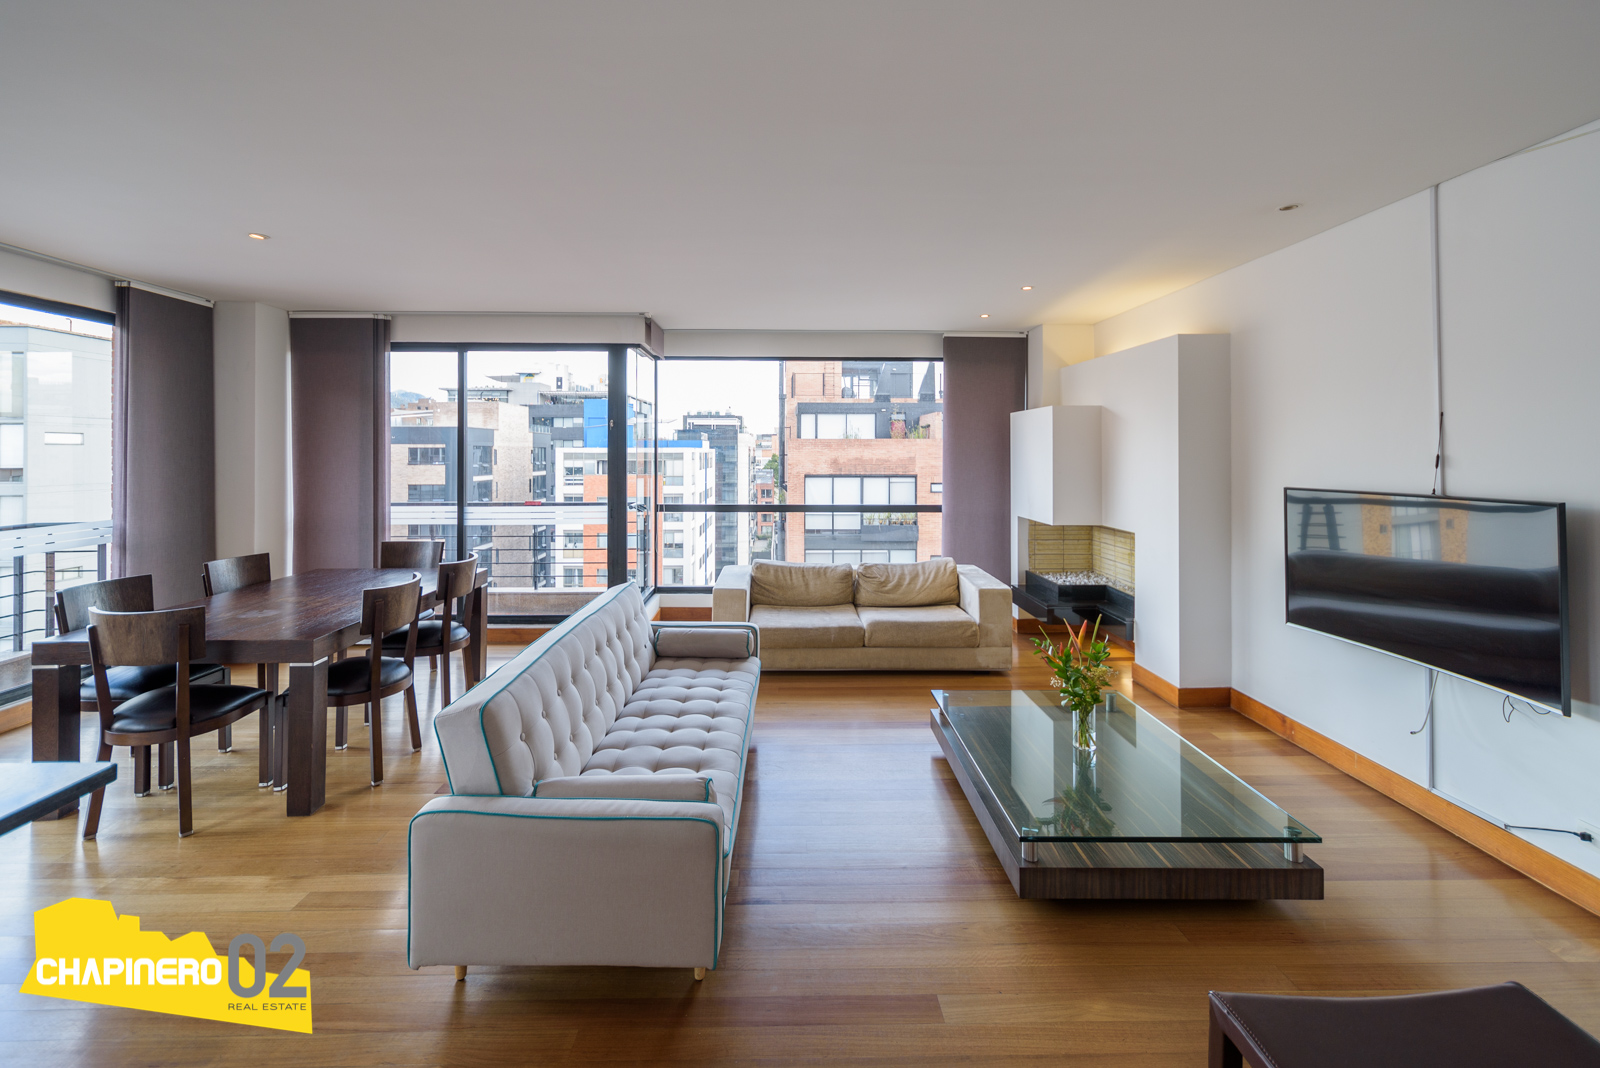 Apto Venta :: 170 m² :: Chicó Norte :: $1.300M